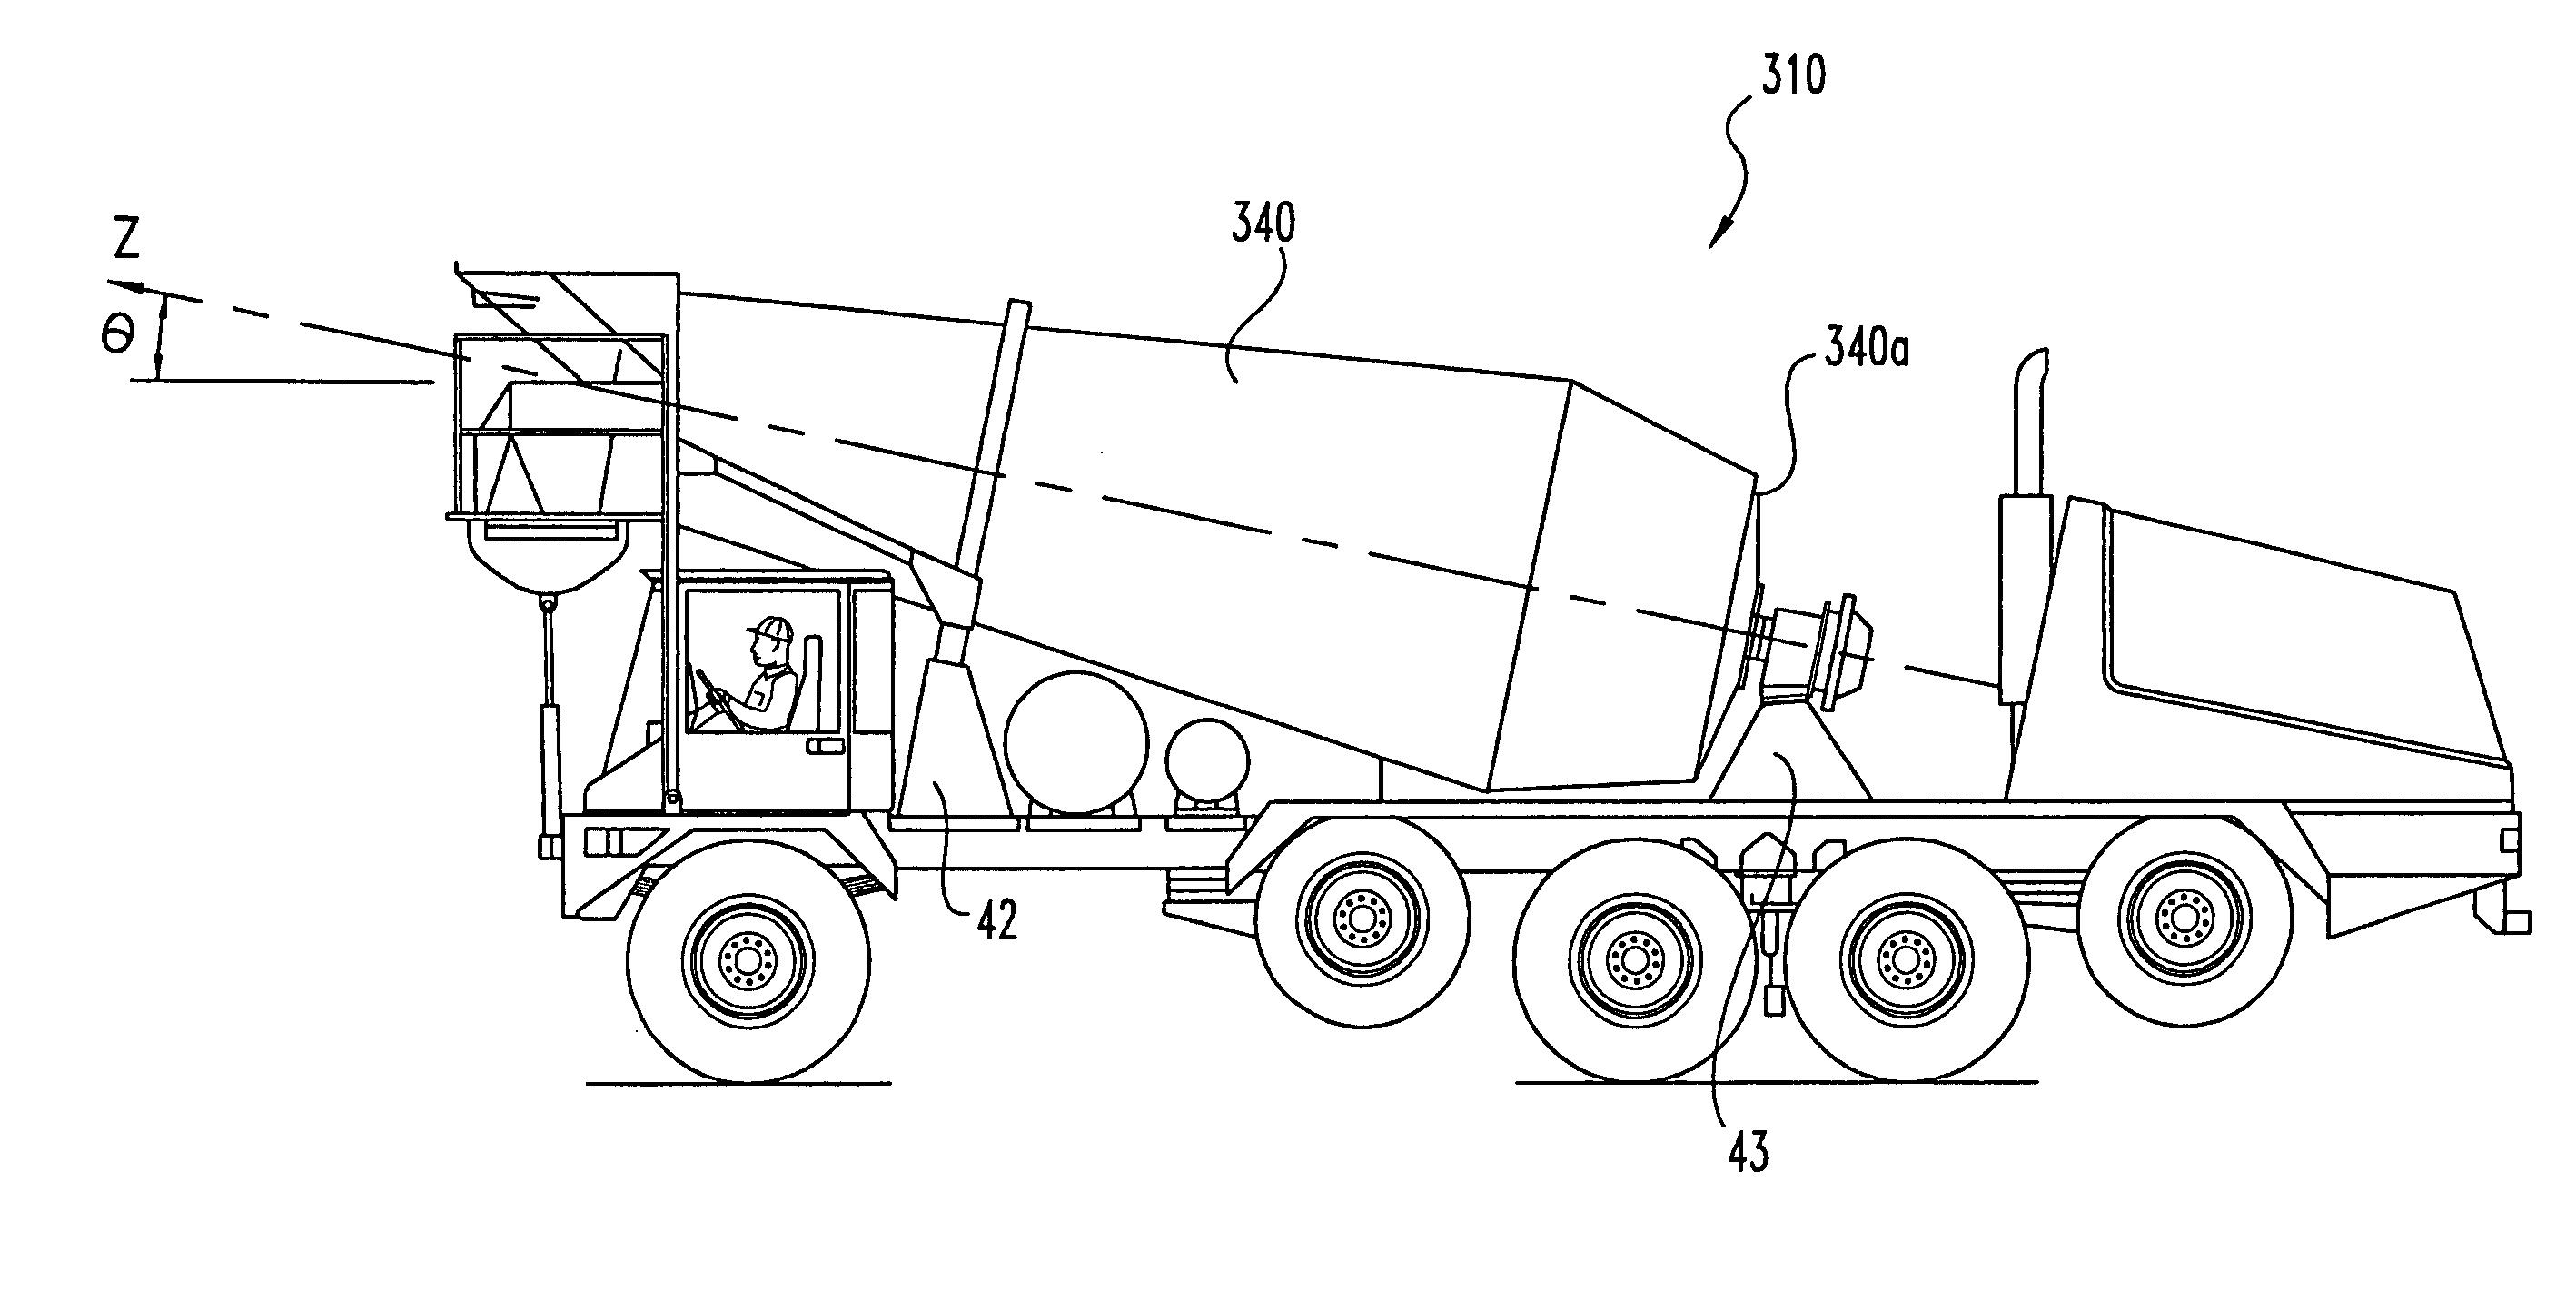 Front Discharge Concrete Mixer Truck Diagrams